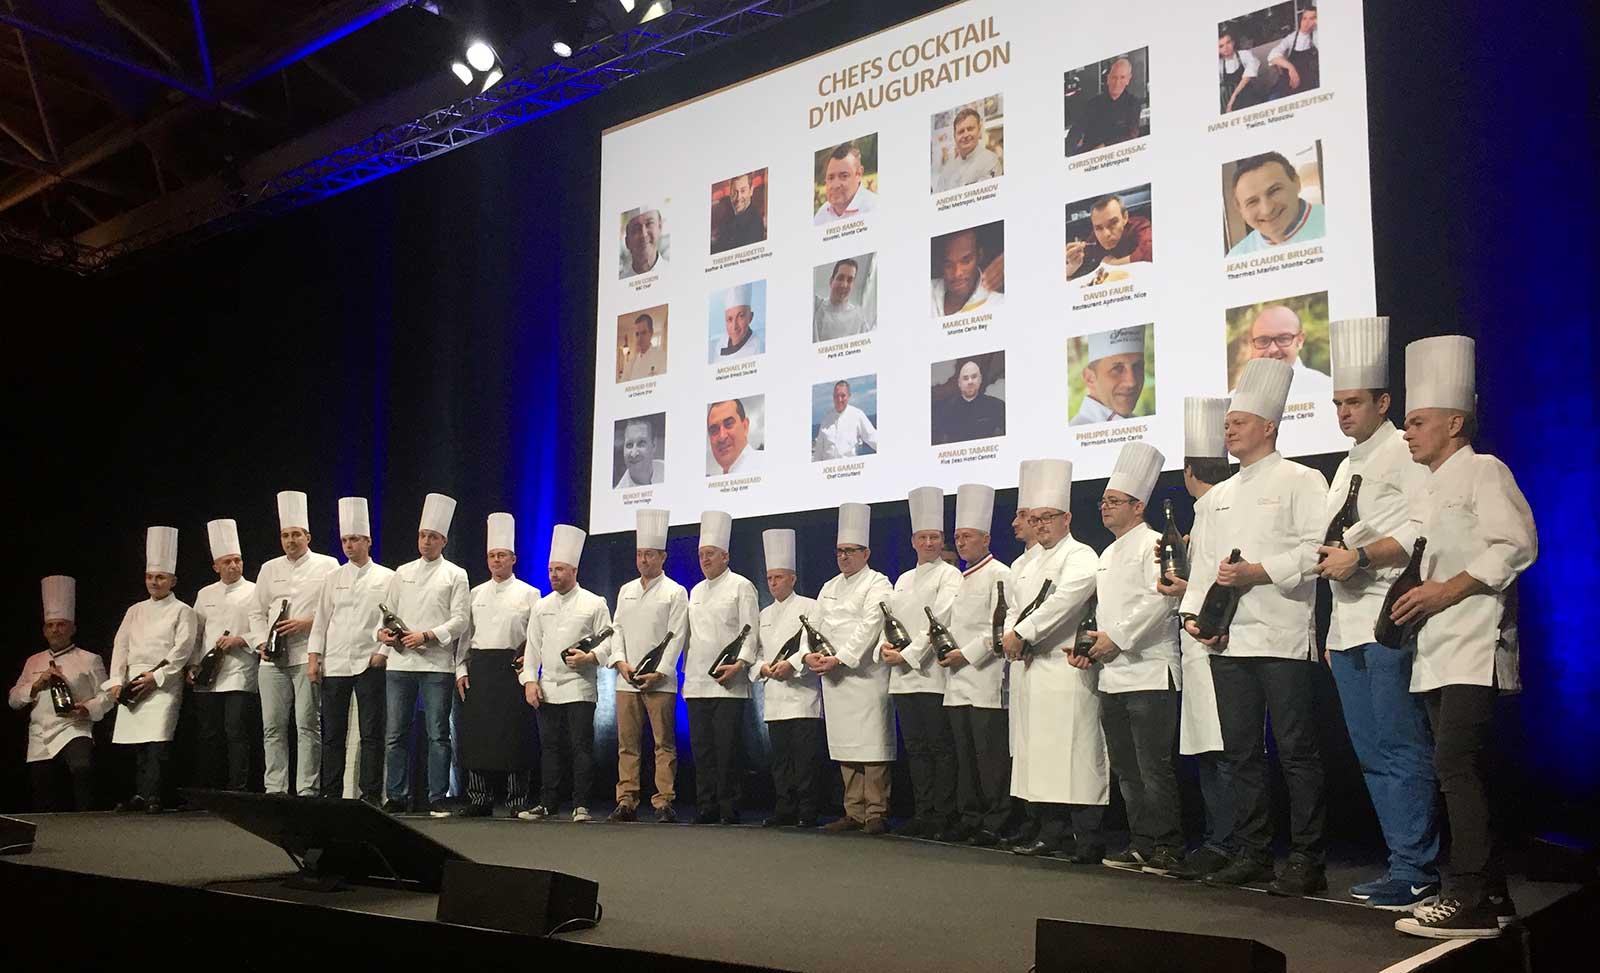 Salon Chefs World Summit 2017 à Monaco